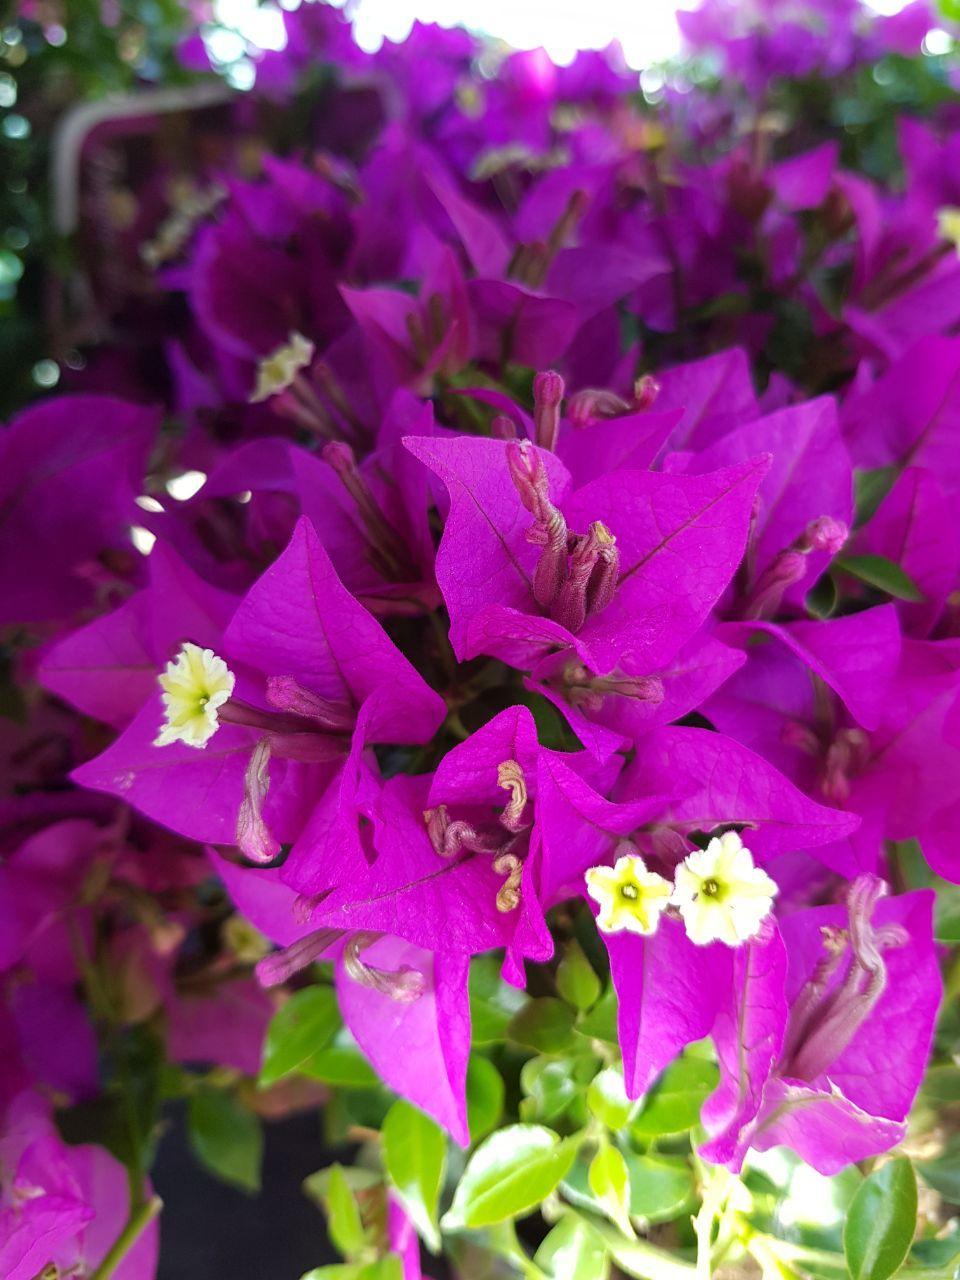 Tolle Gartengestaltung Mit Bougainvillea Bougainvillea Buxbaum Olivenbaum Olive Lavendel Entspannung Mediterran Ga Bougainvillea Garten Design Pflanzen